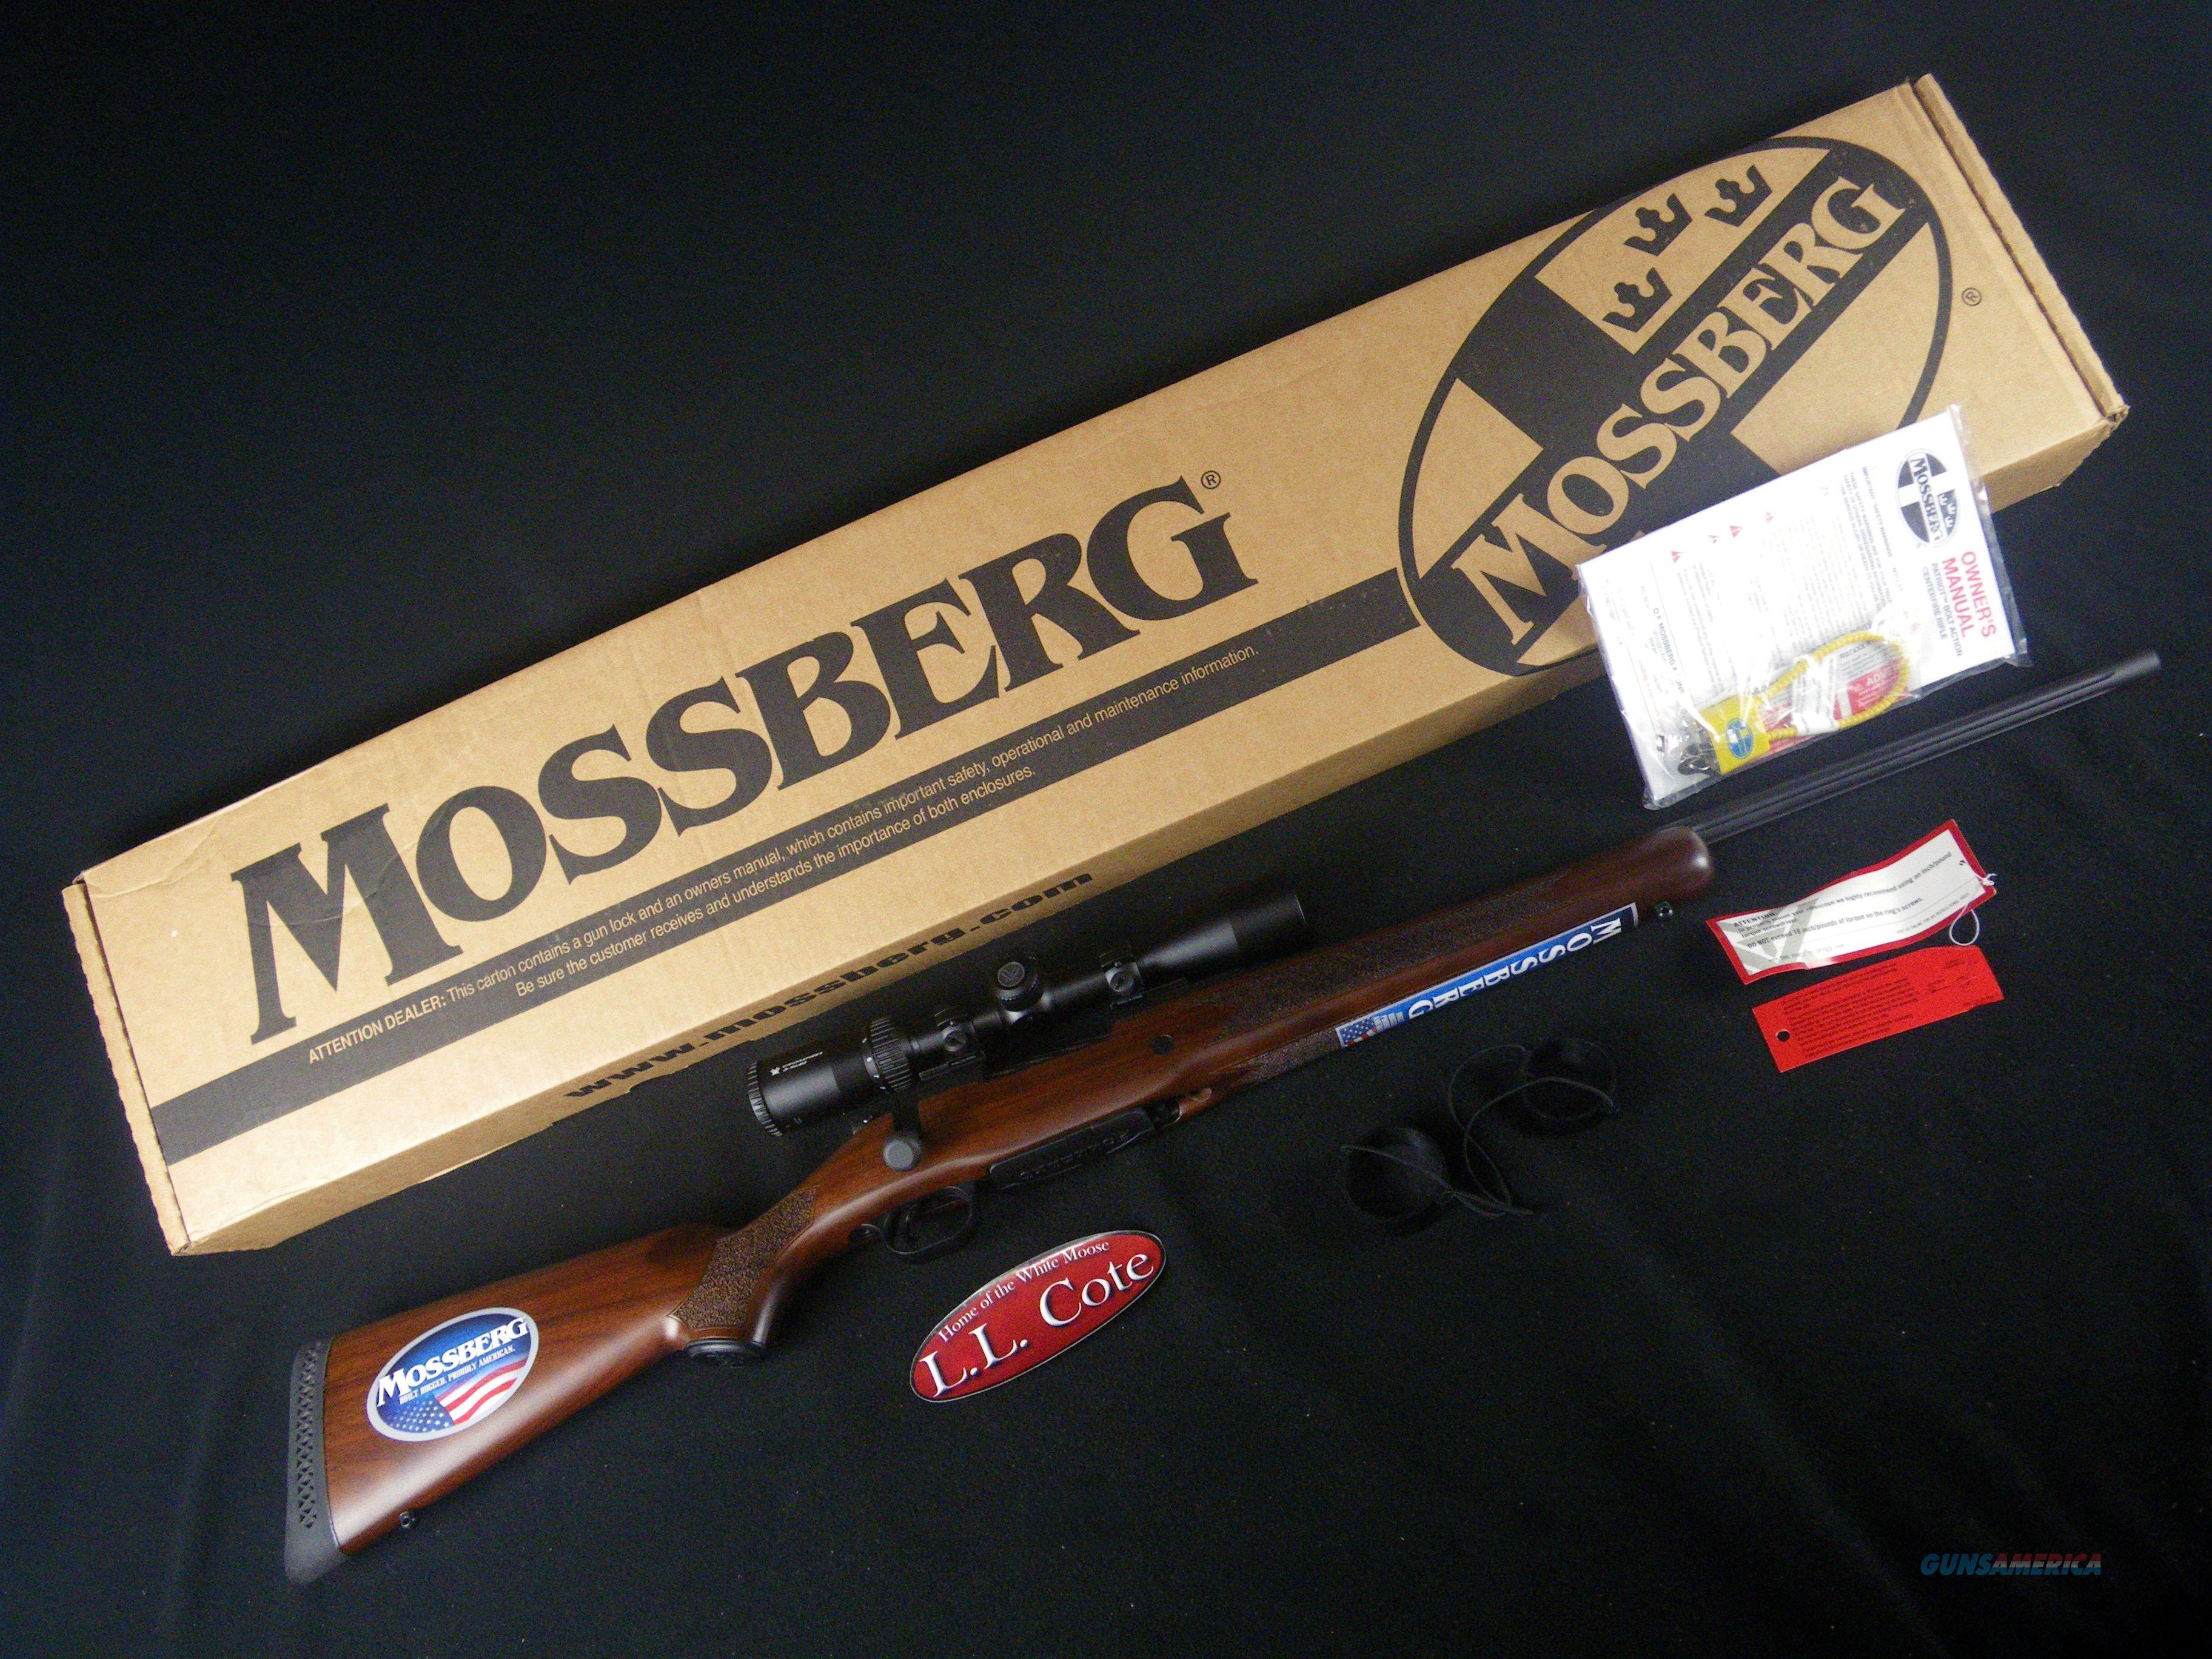 "Mossberg Patriot Vortex Combo 6.5 Creed 22"" NEW 28028  Guns > Rifles > Mossberg Rifles > Patriot"